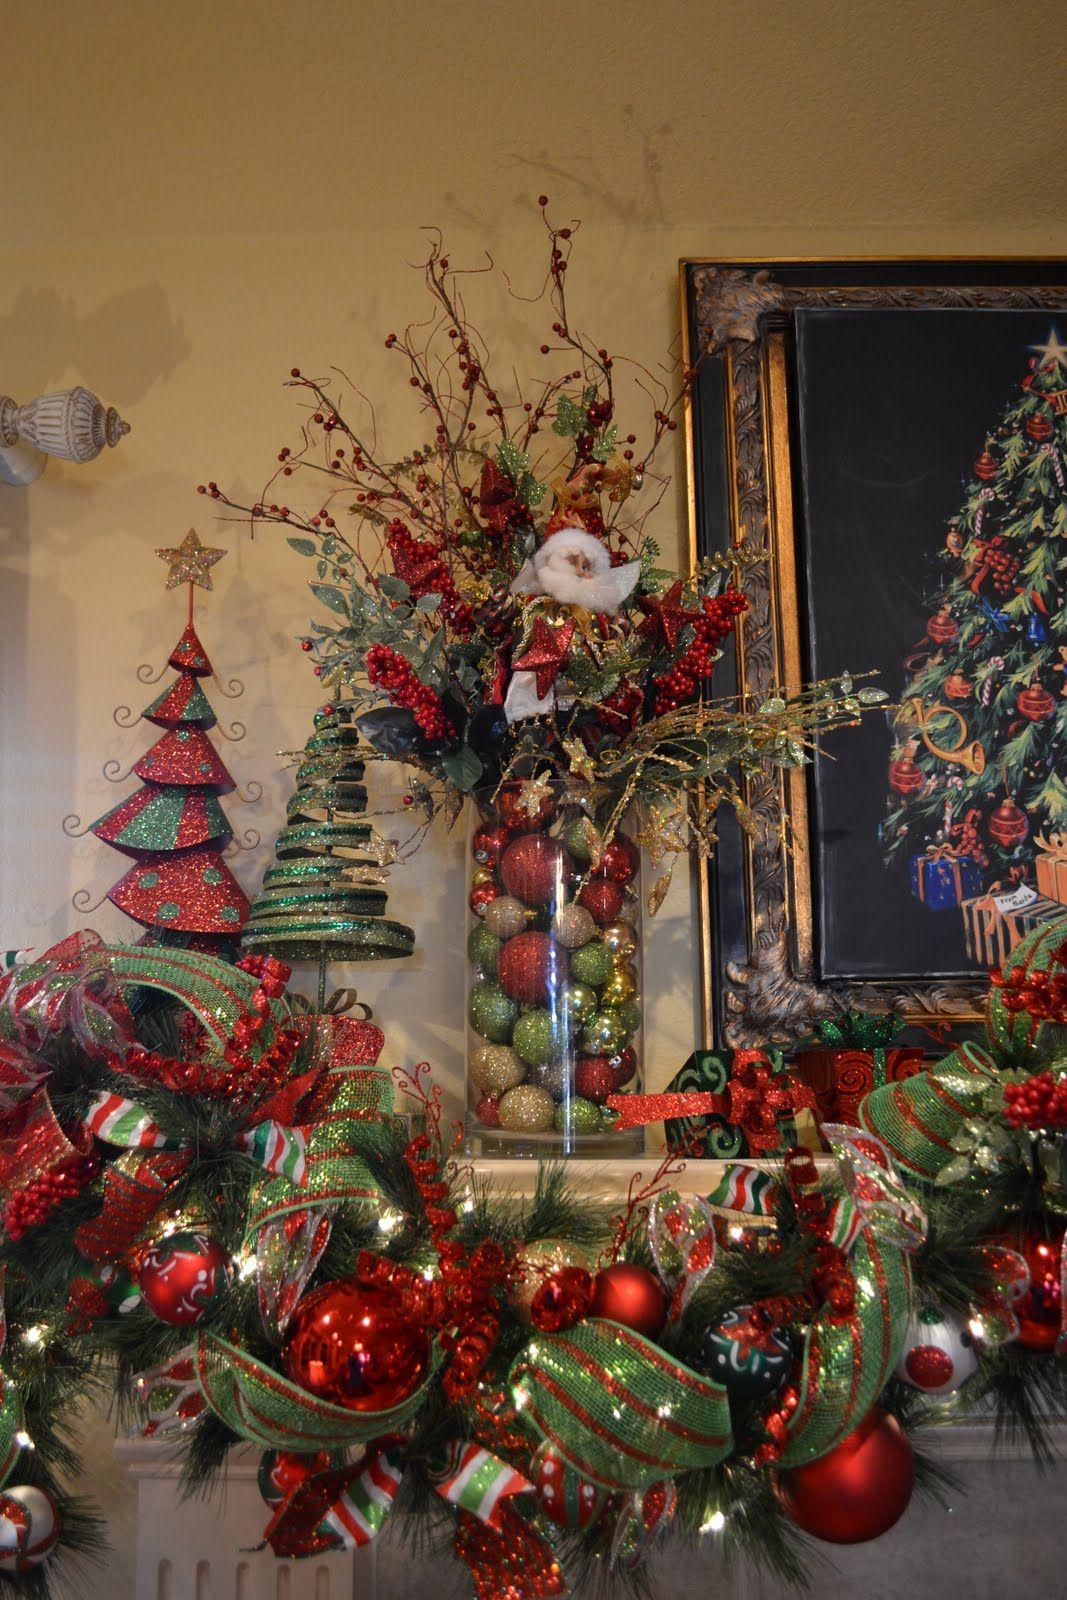 Kristen S Creations My Christmas Mantle Christmas